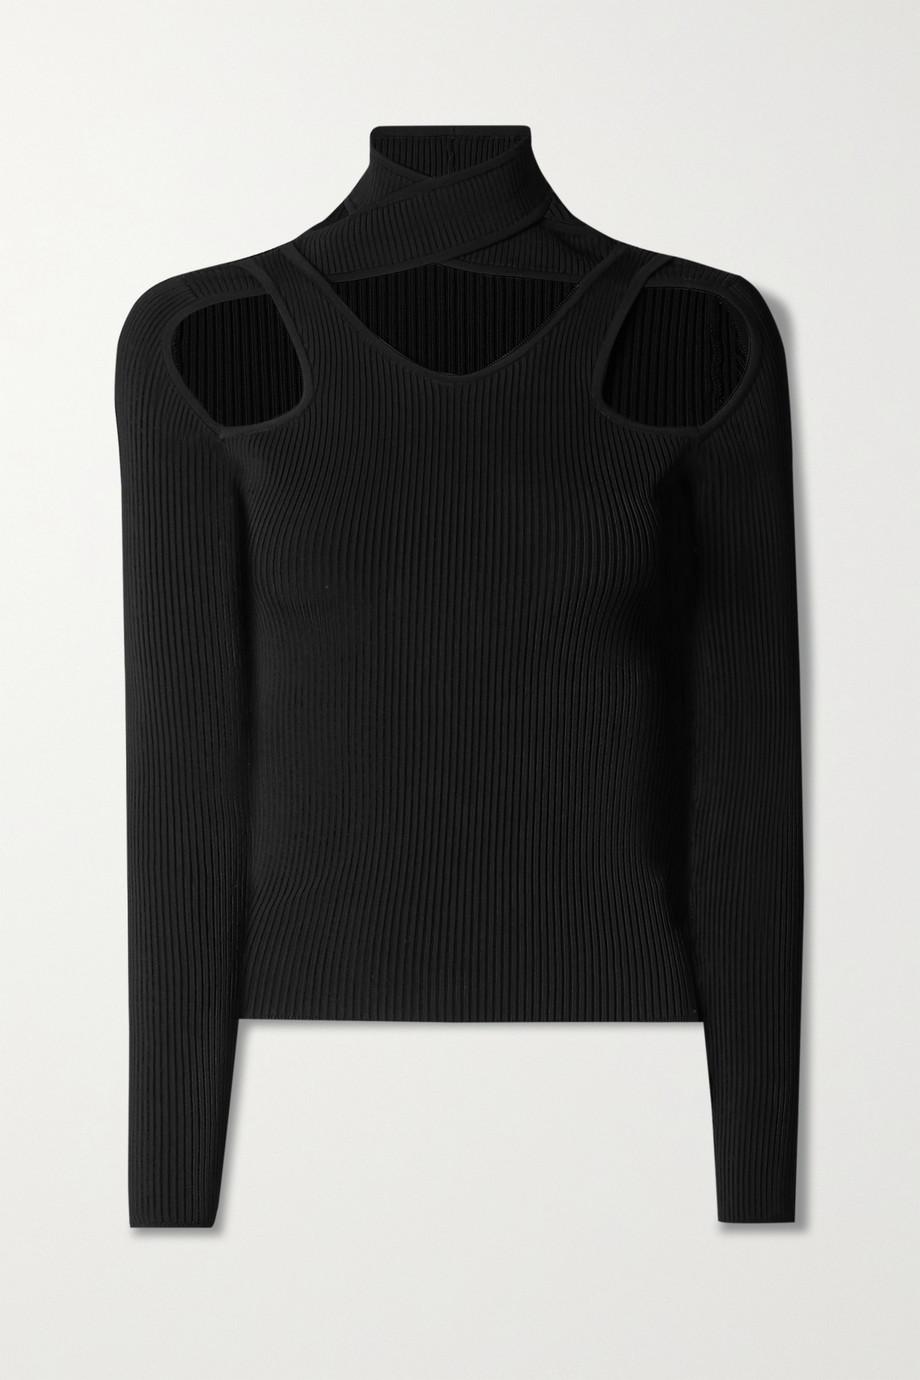 Coperni Cutout ribbed-knit top